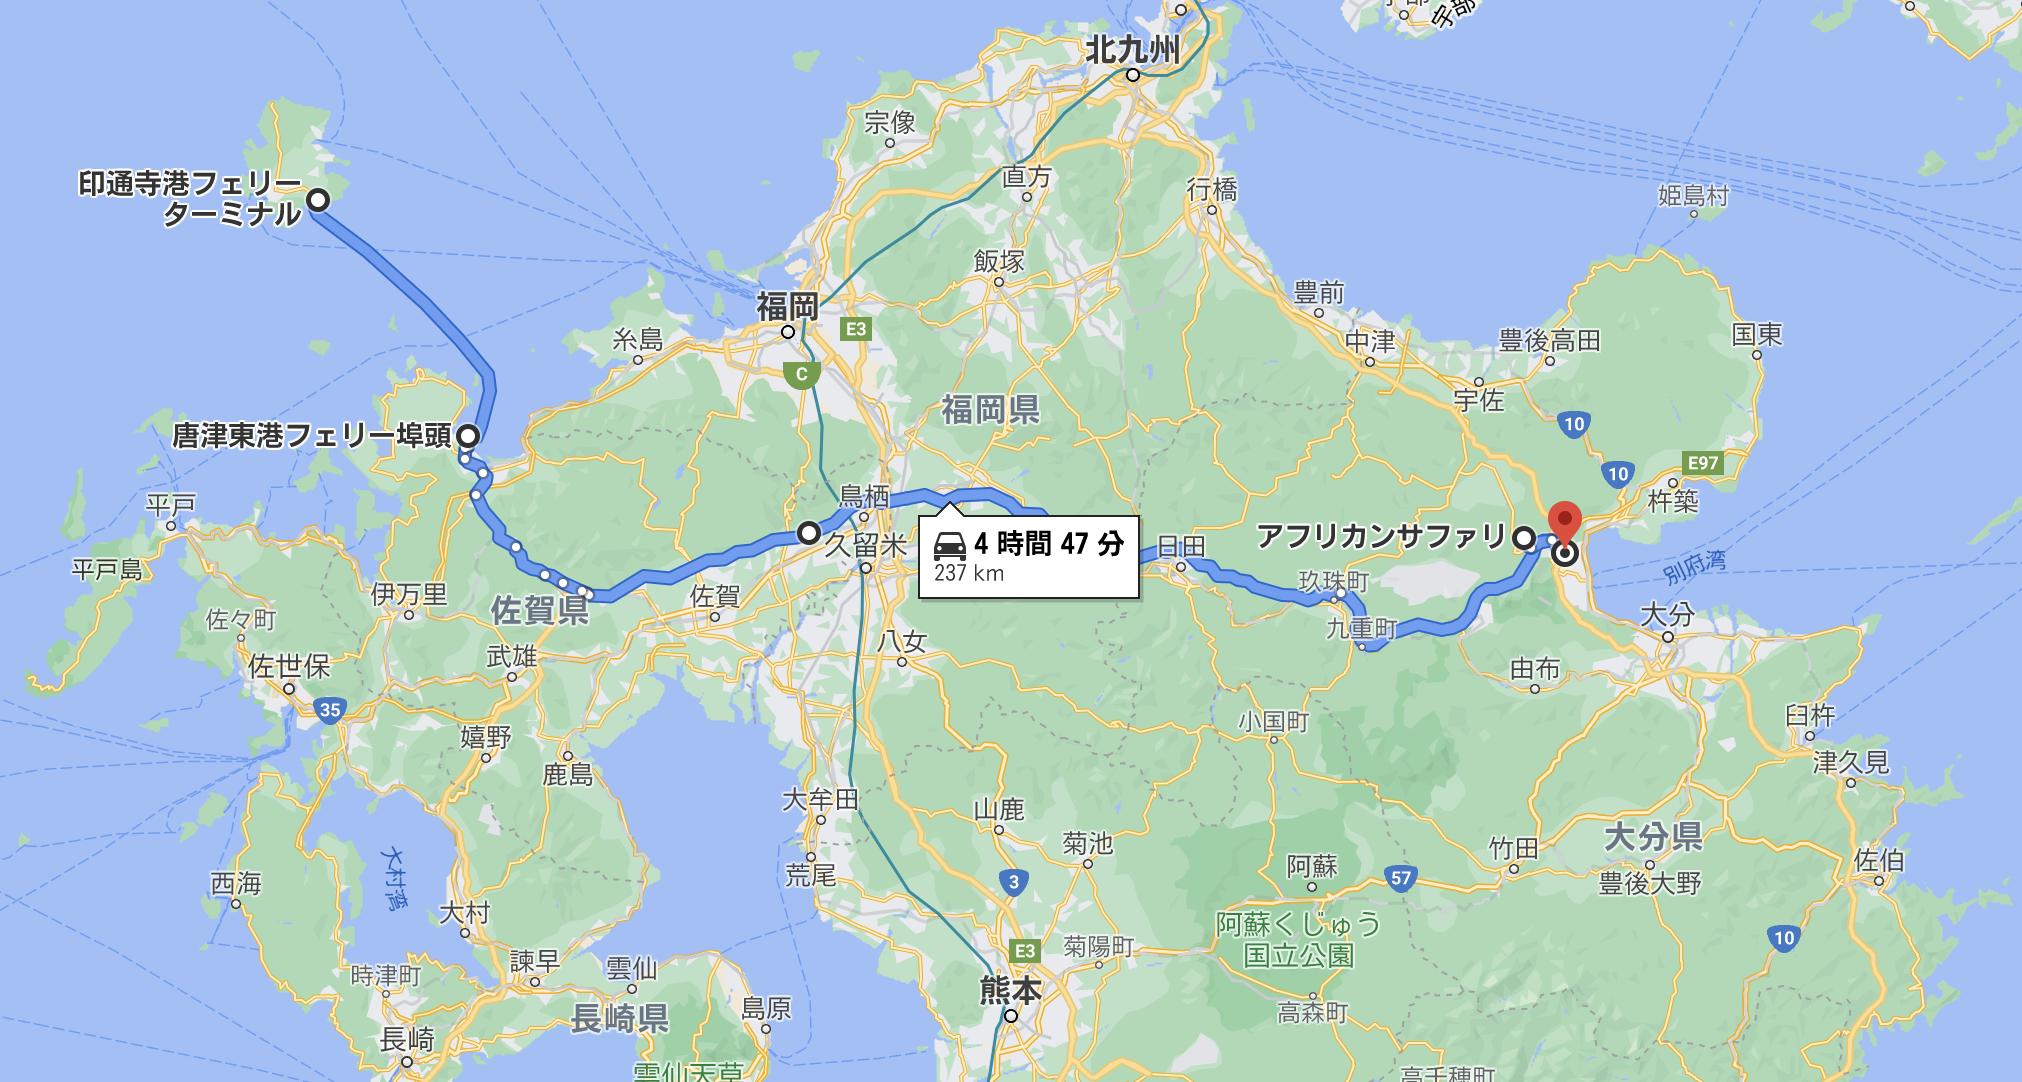 map of northern Kyushu